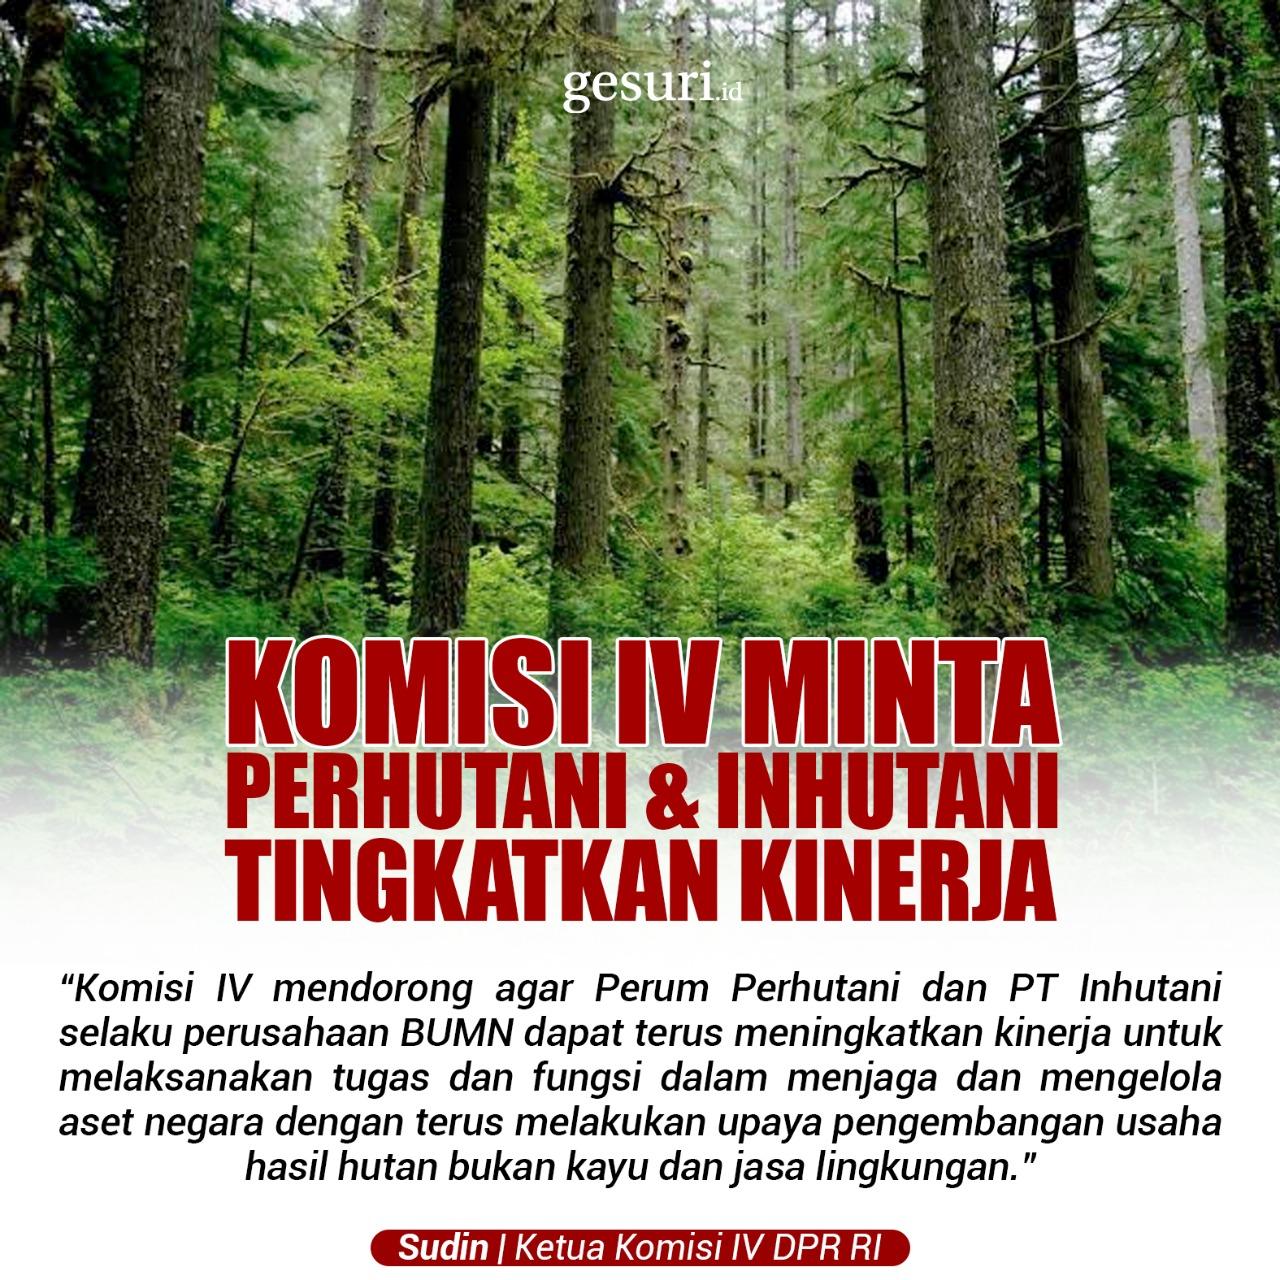 Komisi IV Minta Perhutani dan Inhutani Tingkatkan Kinerja